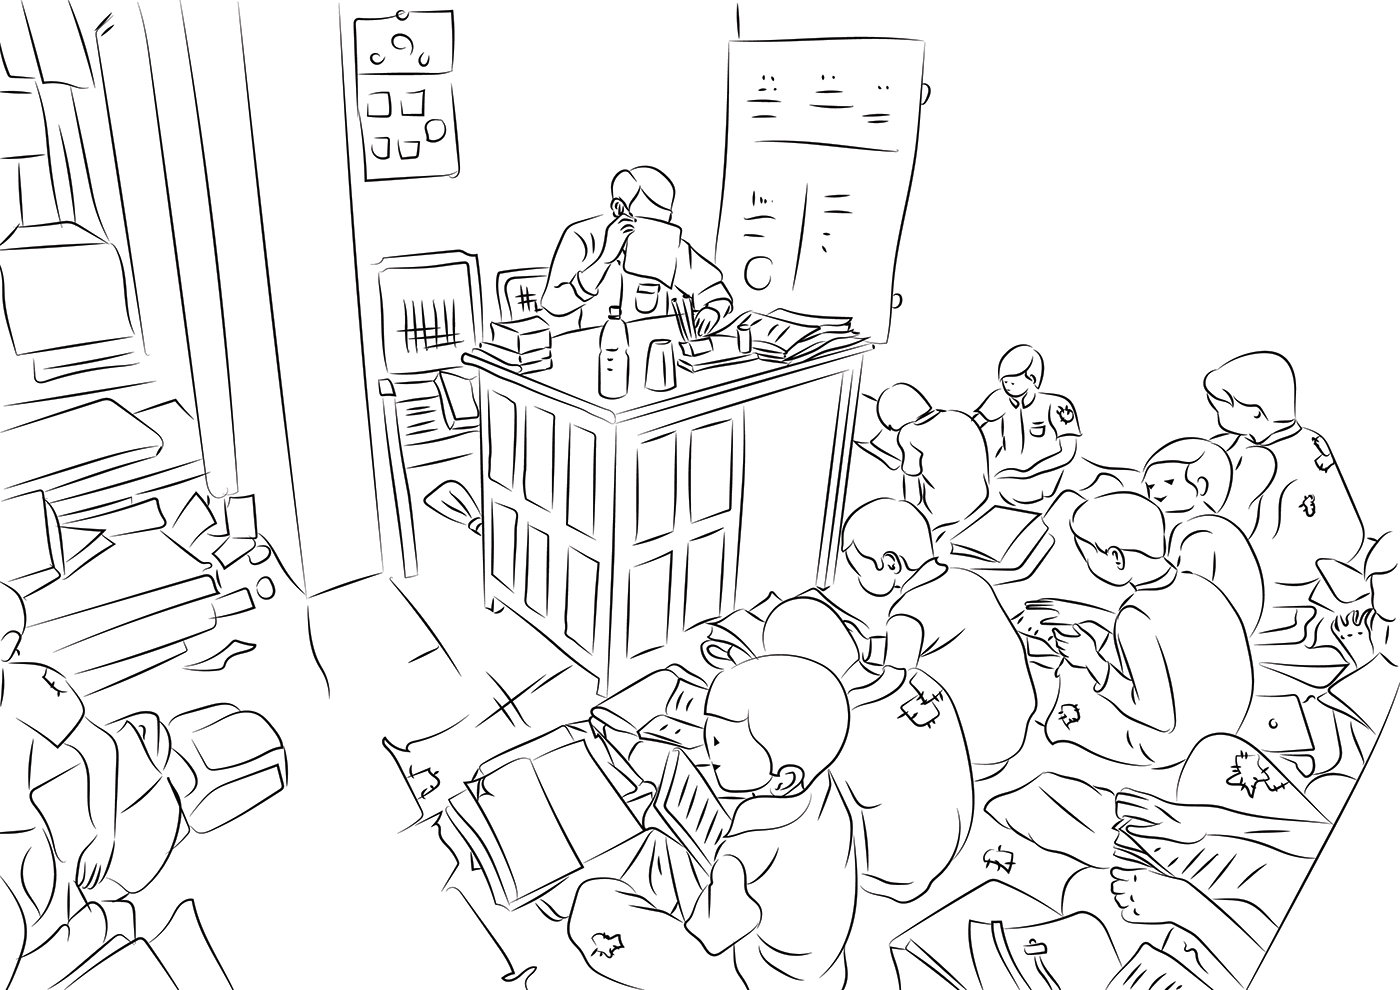 illustrations Digital Drawing concept art story boarding sketching 2d Illustration